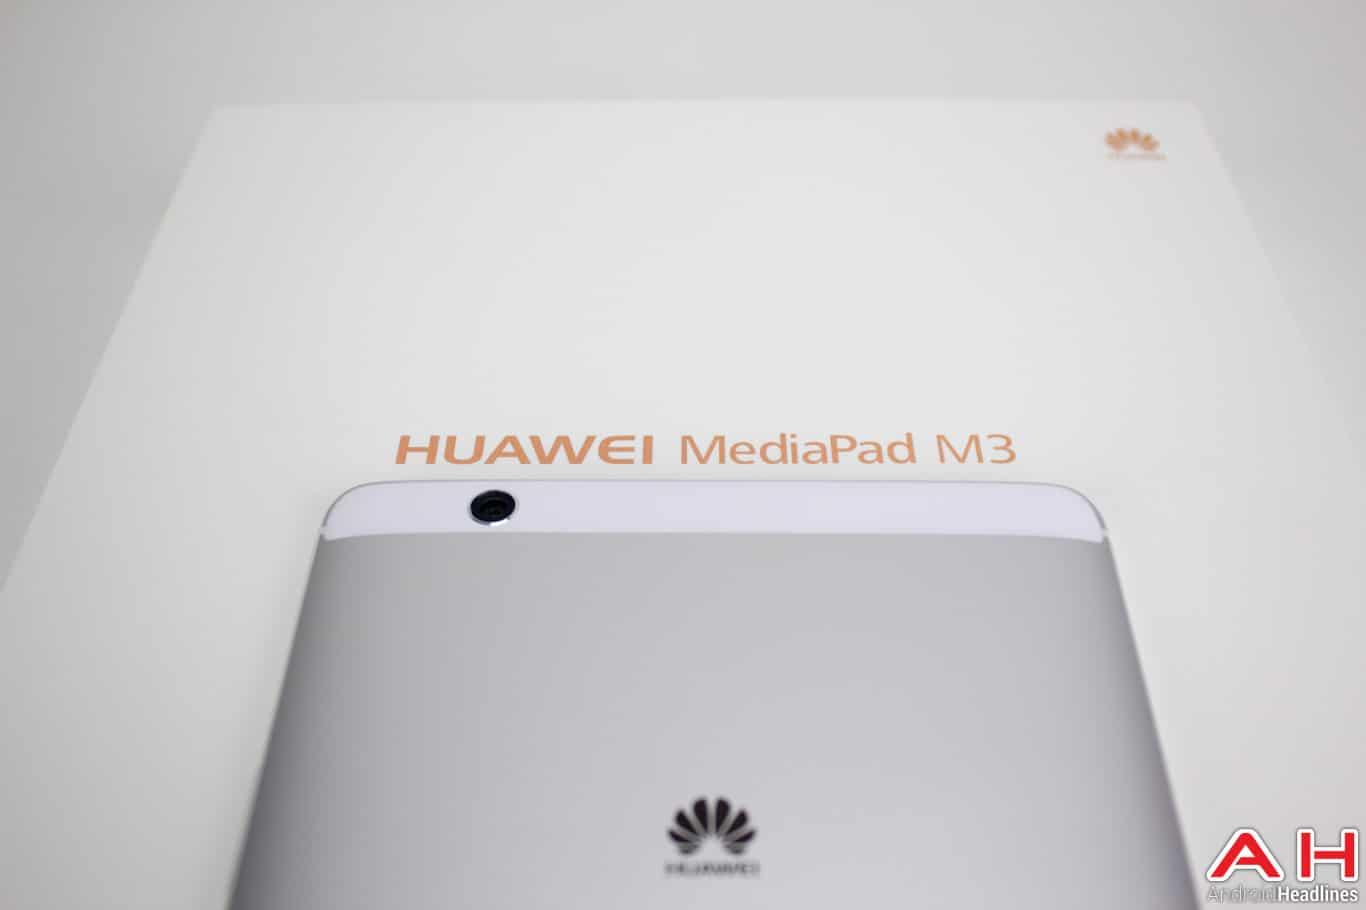 Huawei-MediaPad-M3-AH-NS-11-logo